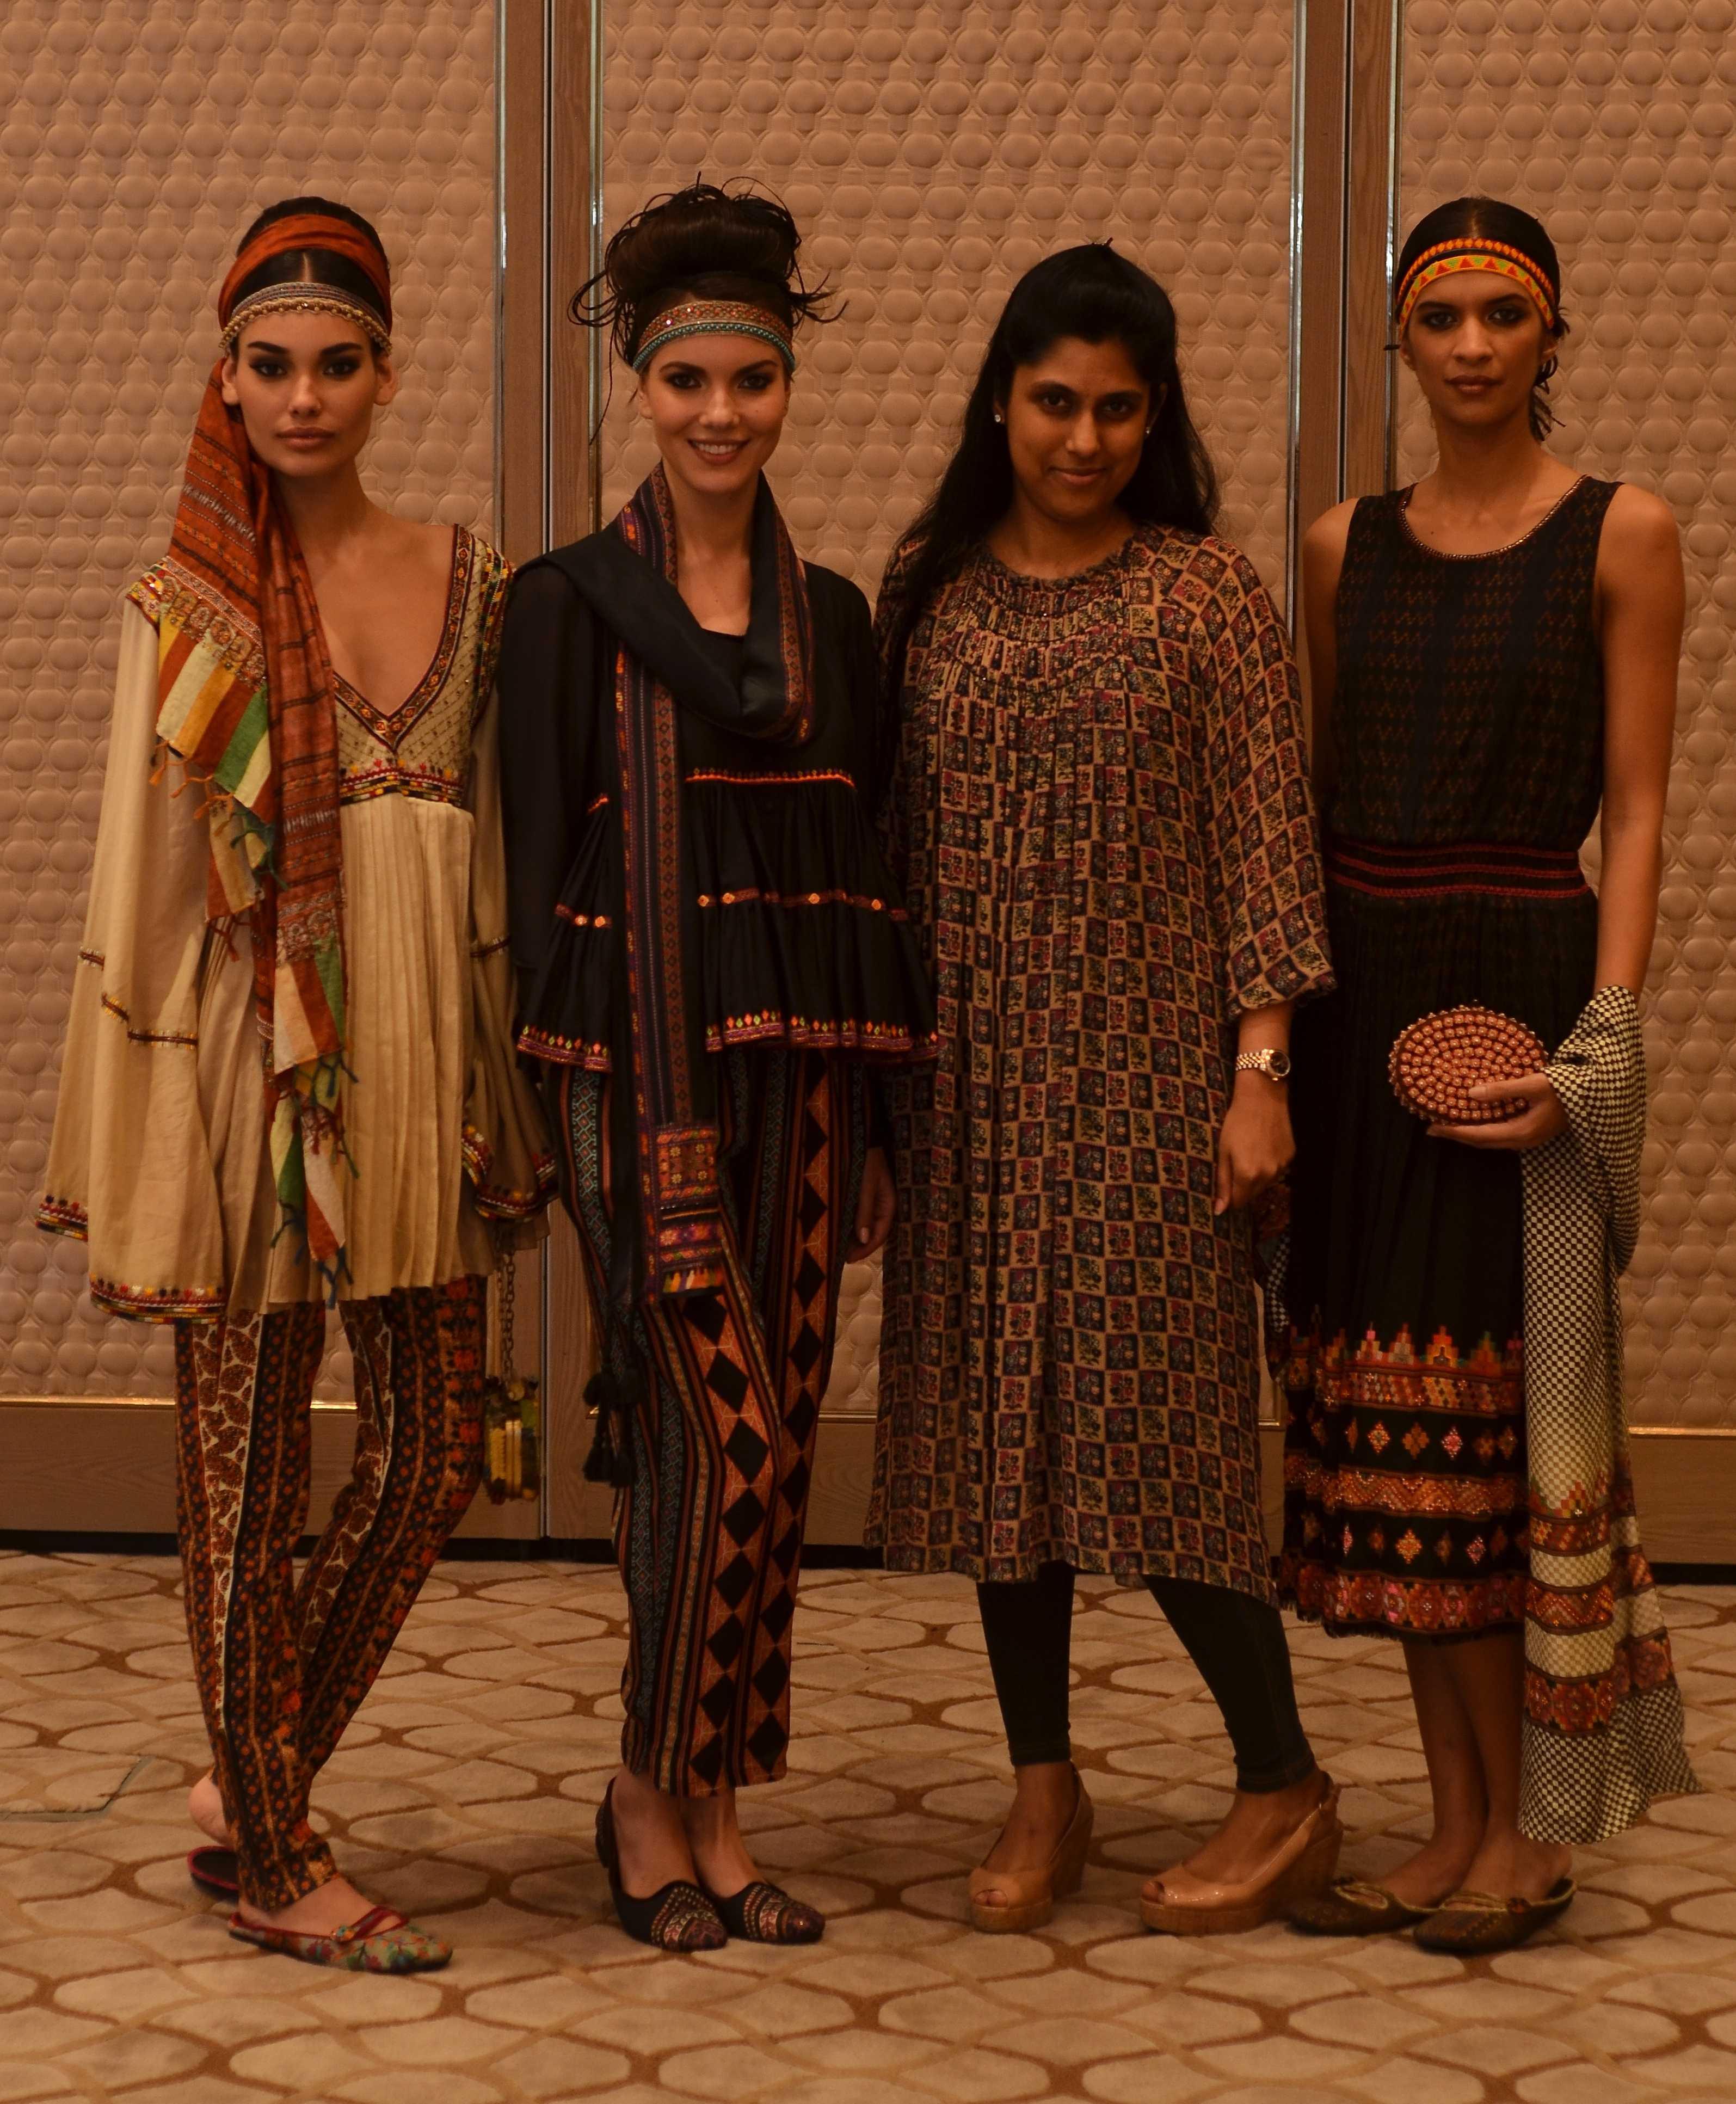 Vogue Fashion Fund semi-finalist Tanvi Kedia with her collection